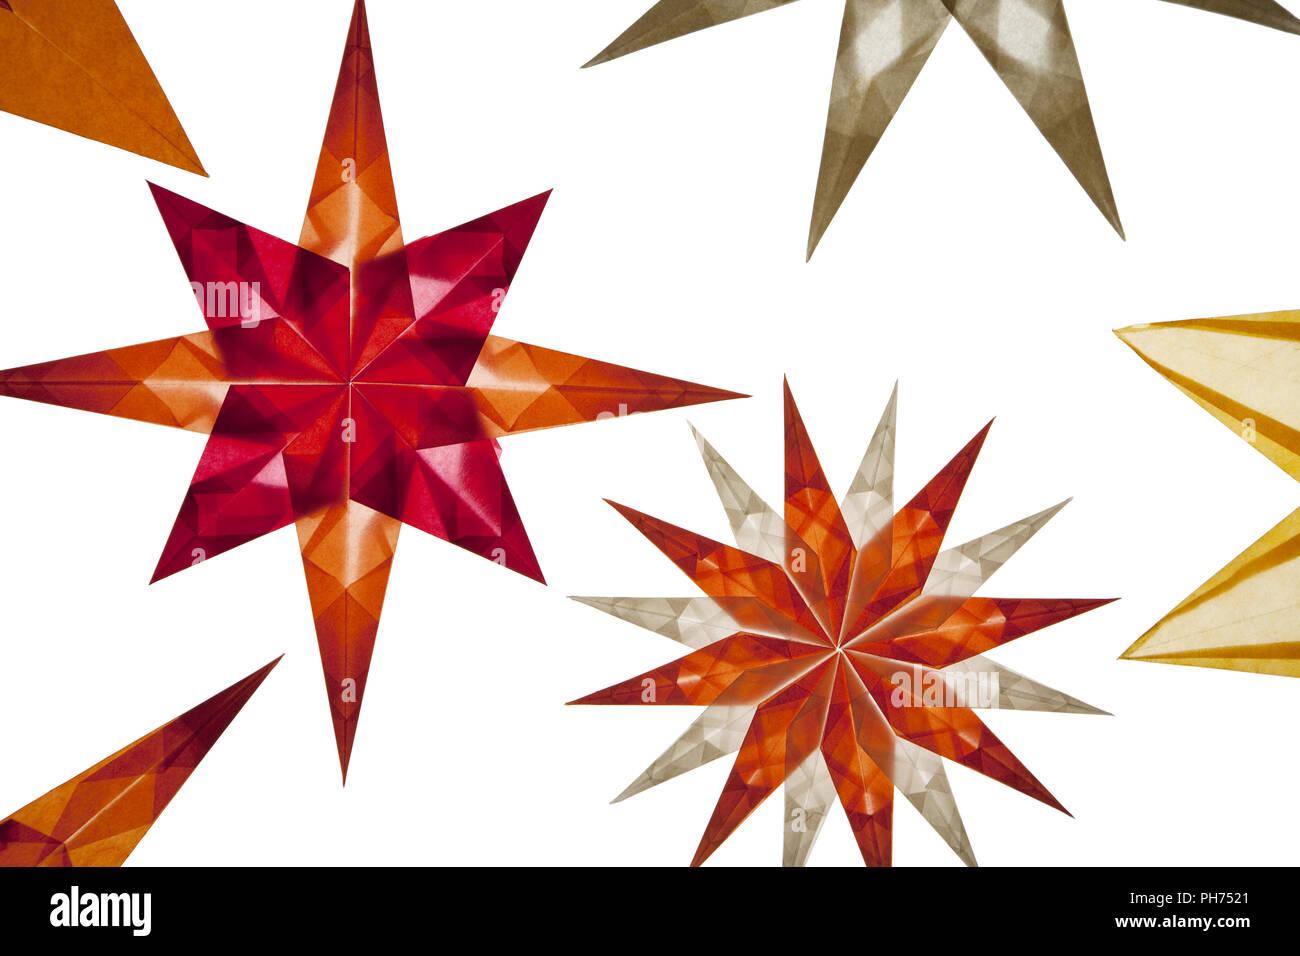 Transparent stars, window decoration, cutout - Stock Image